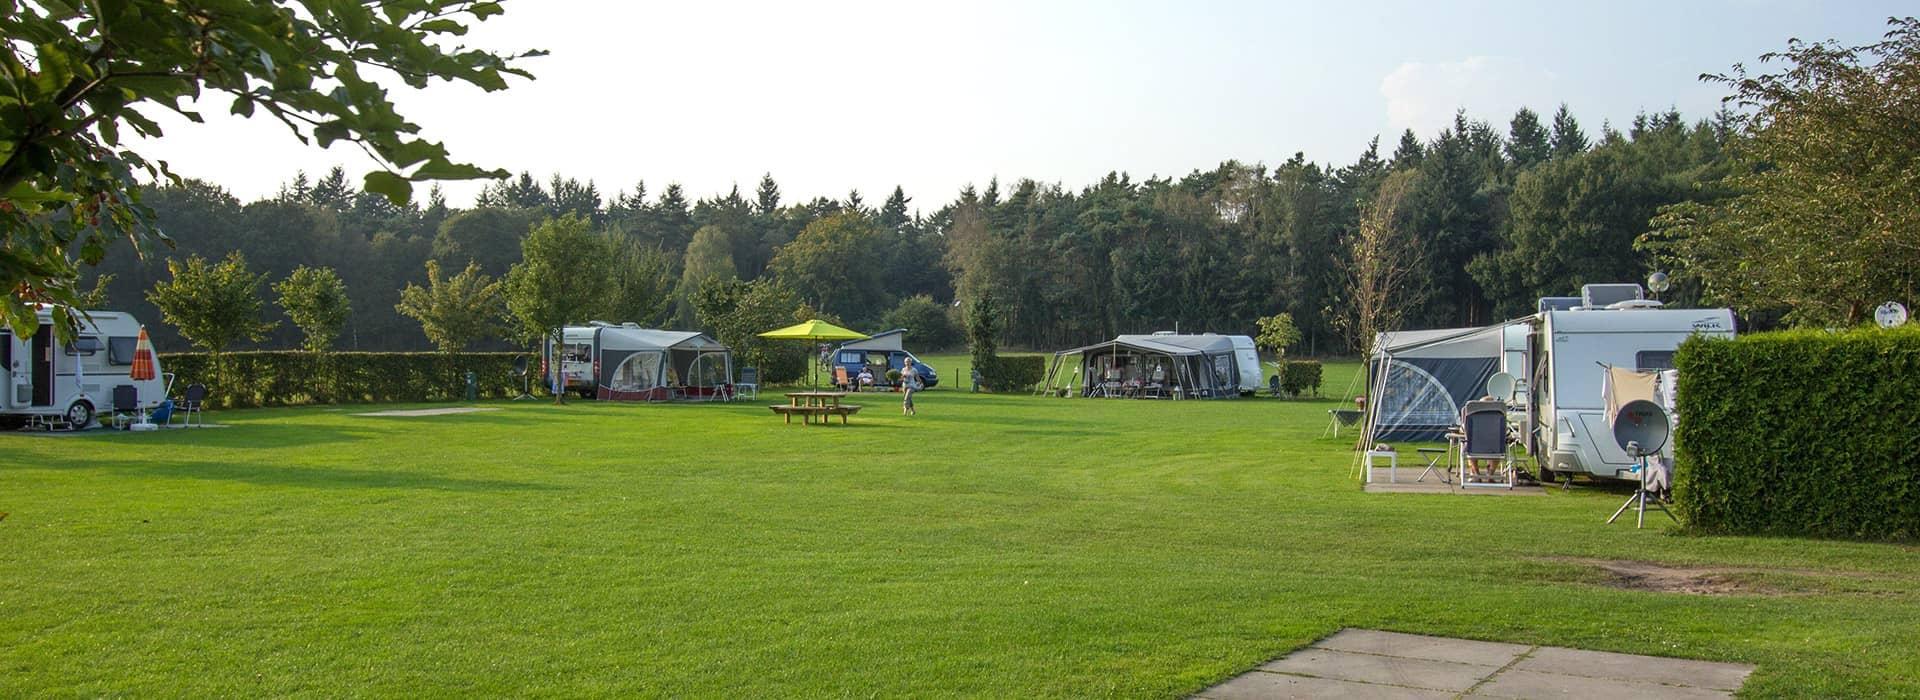 Home header 2 - camping de prinsenhoeve